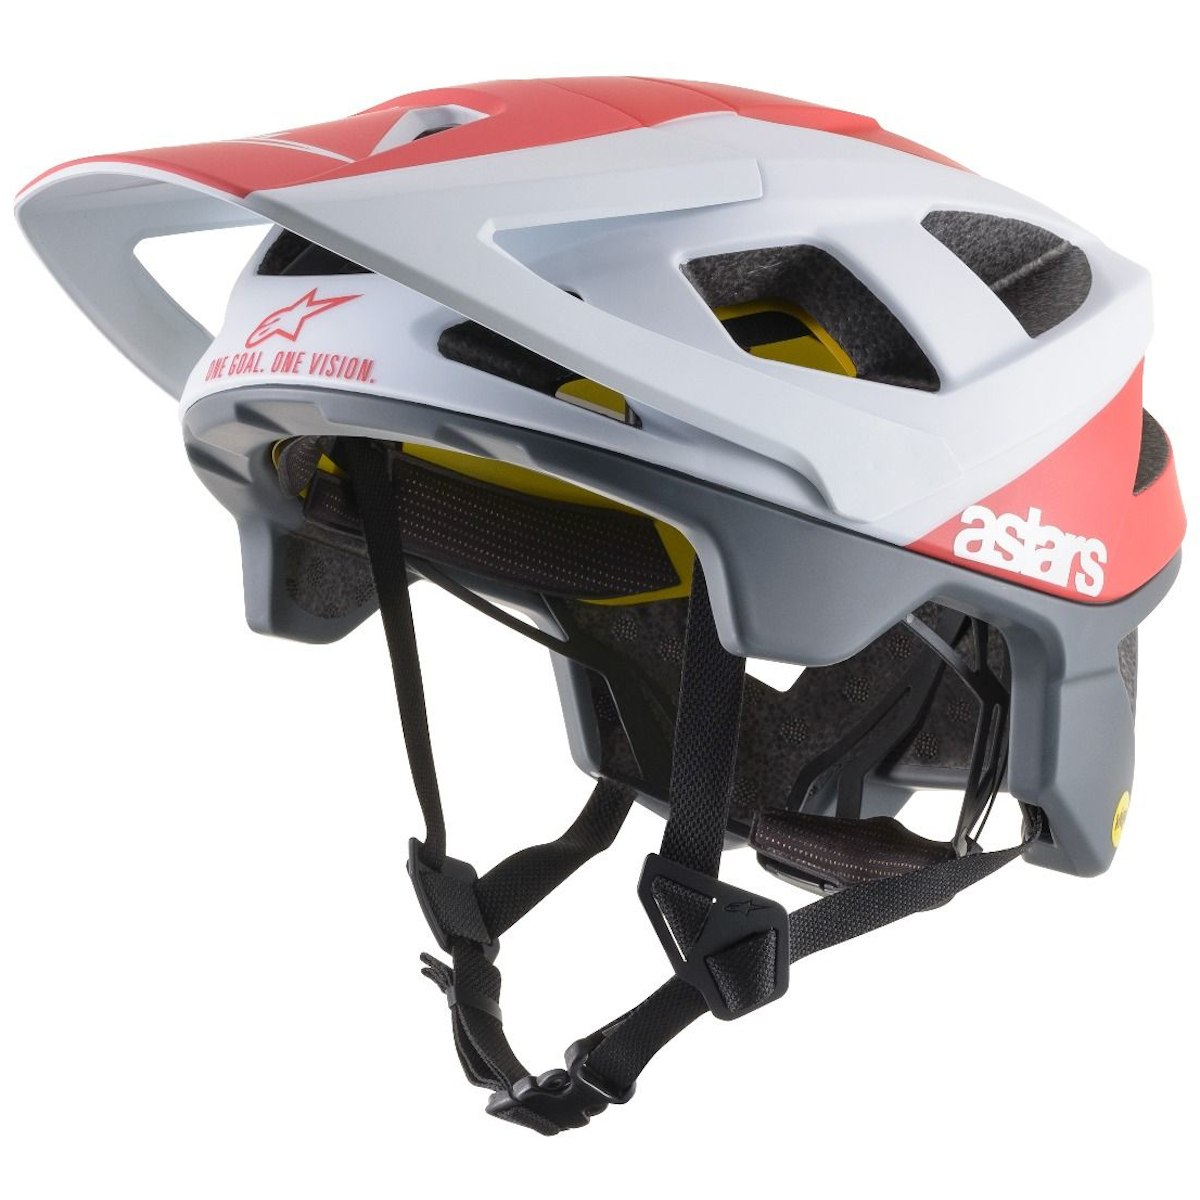 Alpinestars Vector Tech Polar MTB Helmet - white/red matte